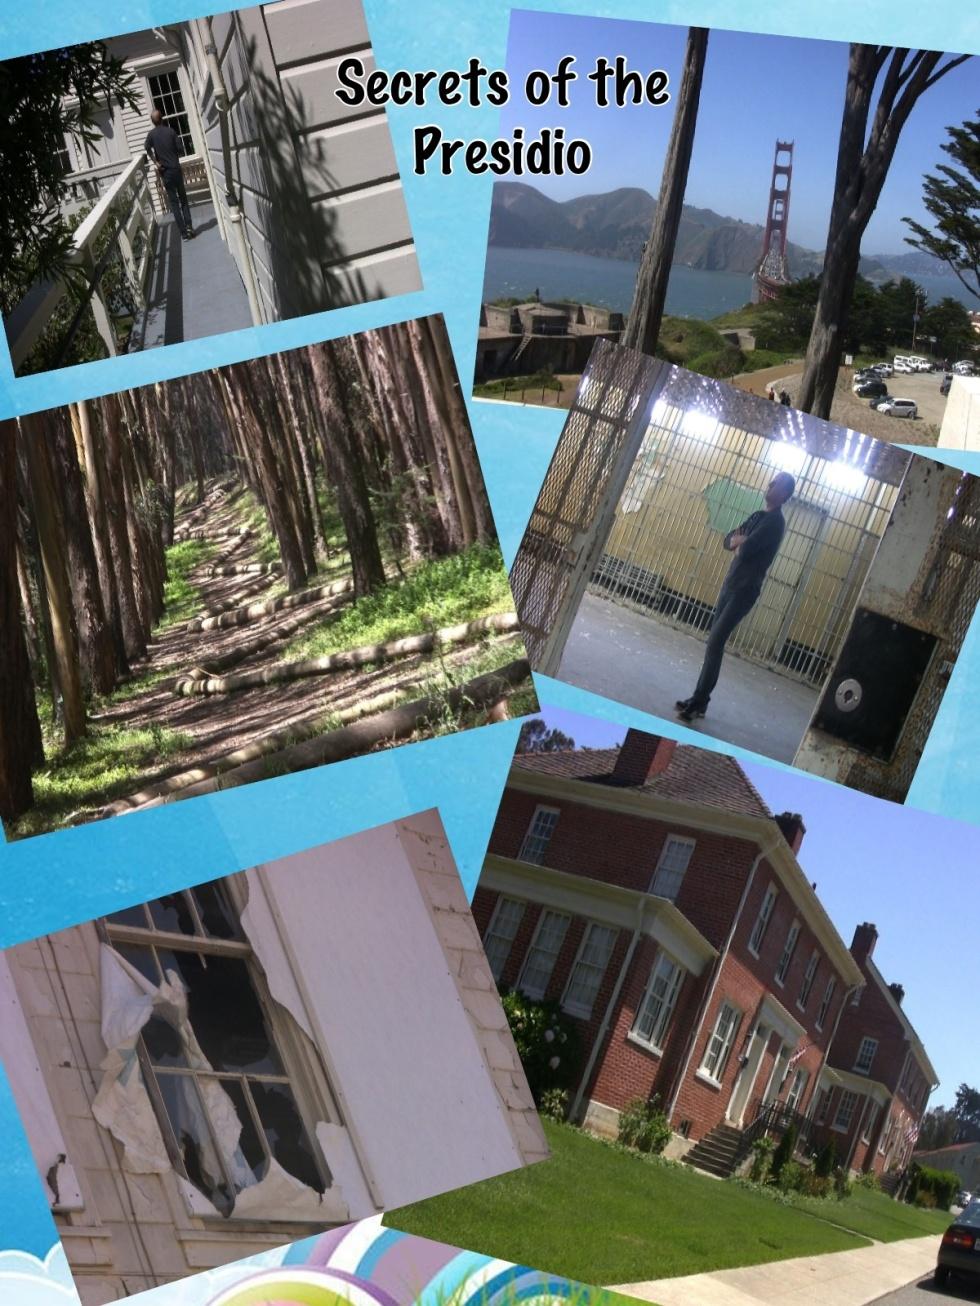 Secrets of Presidio